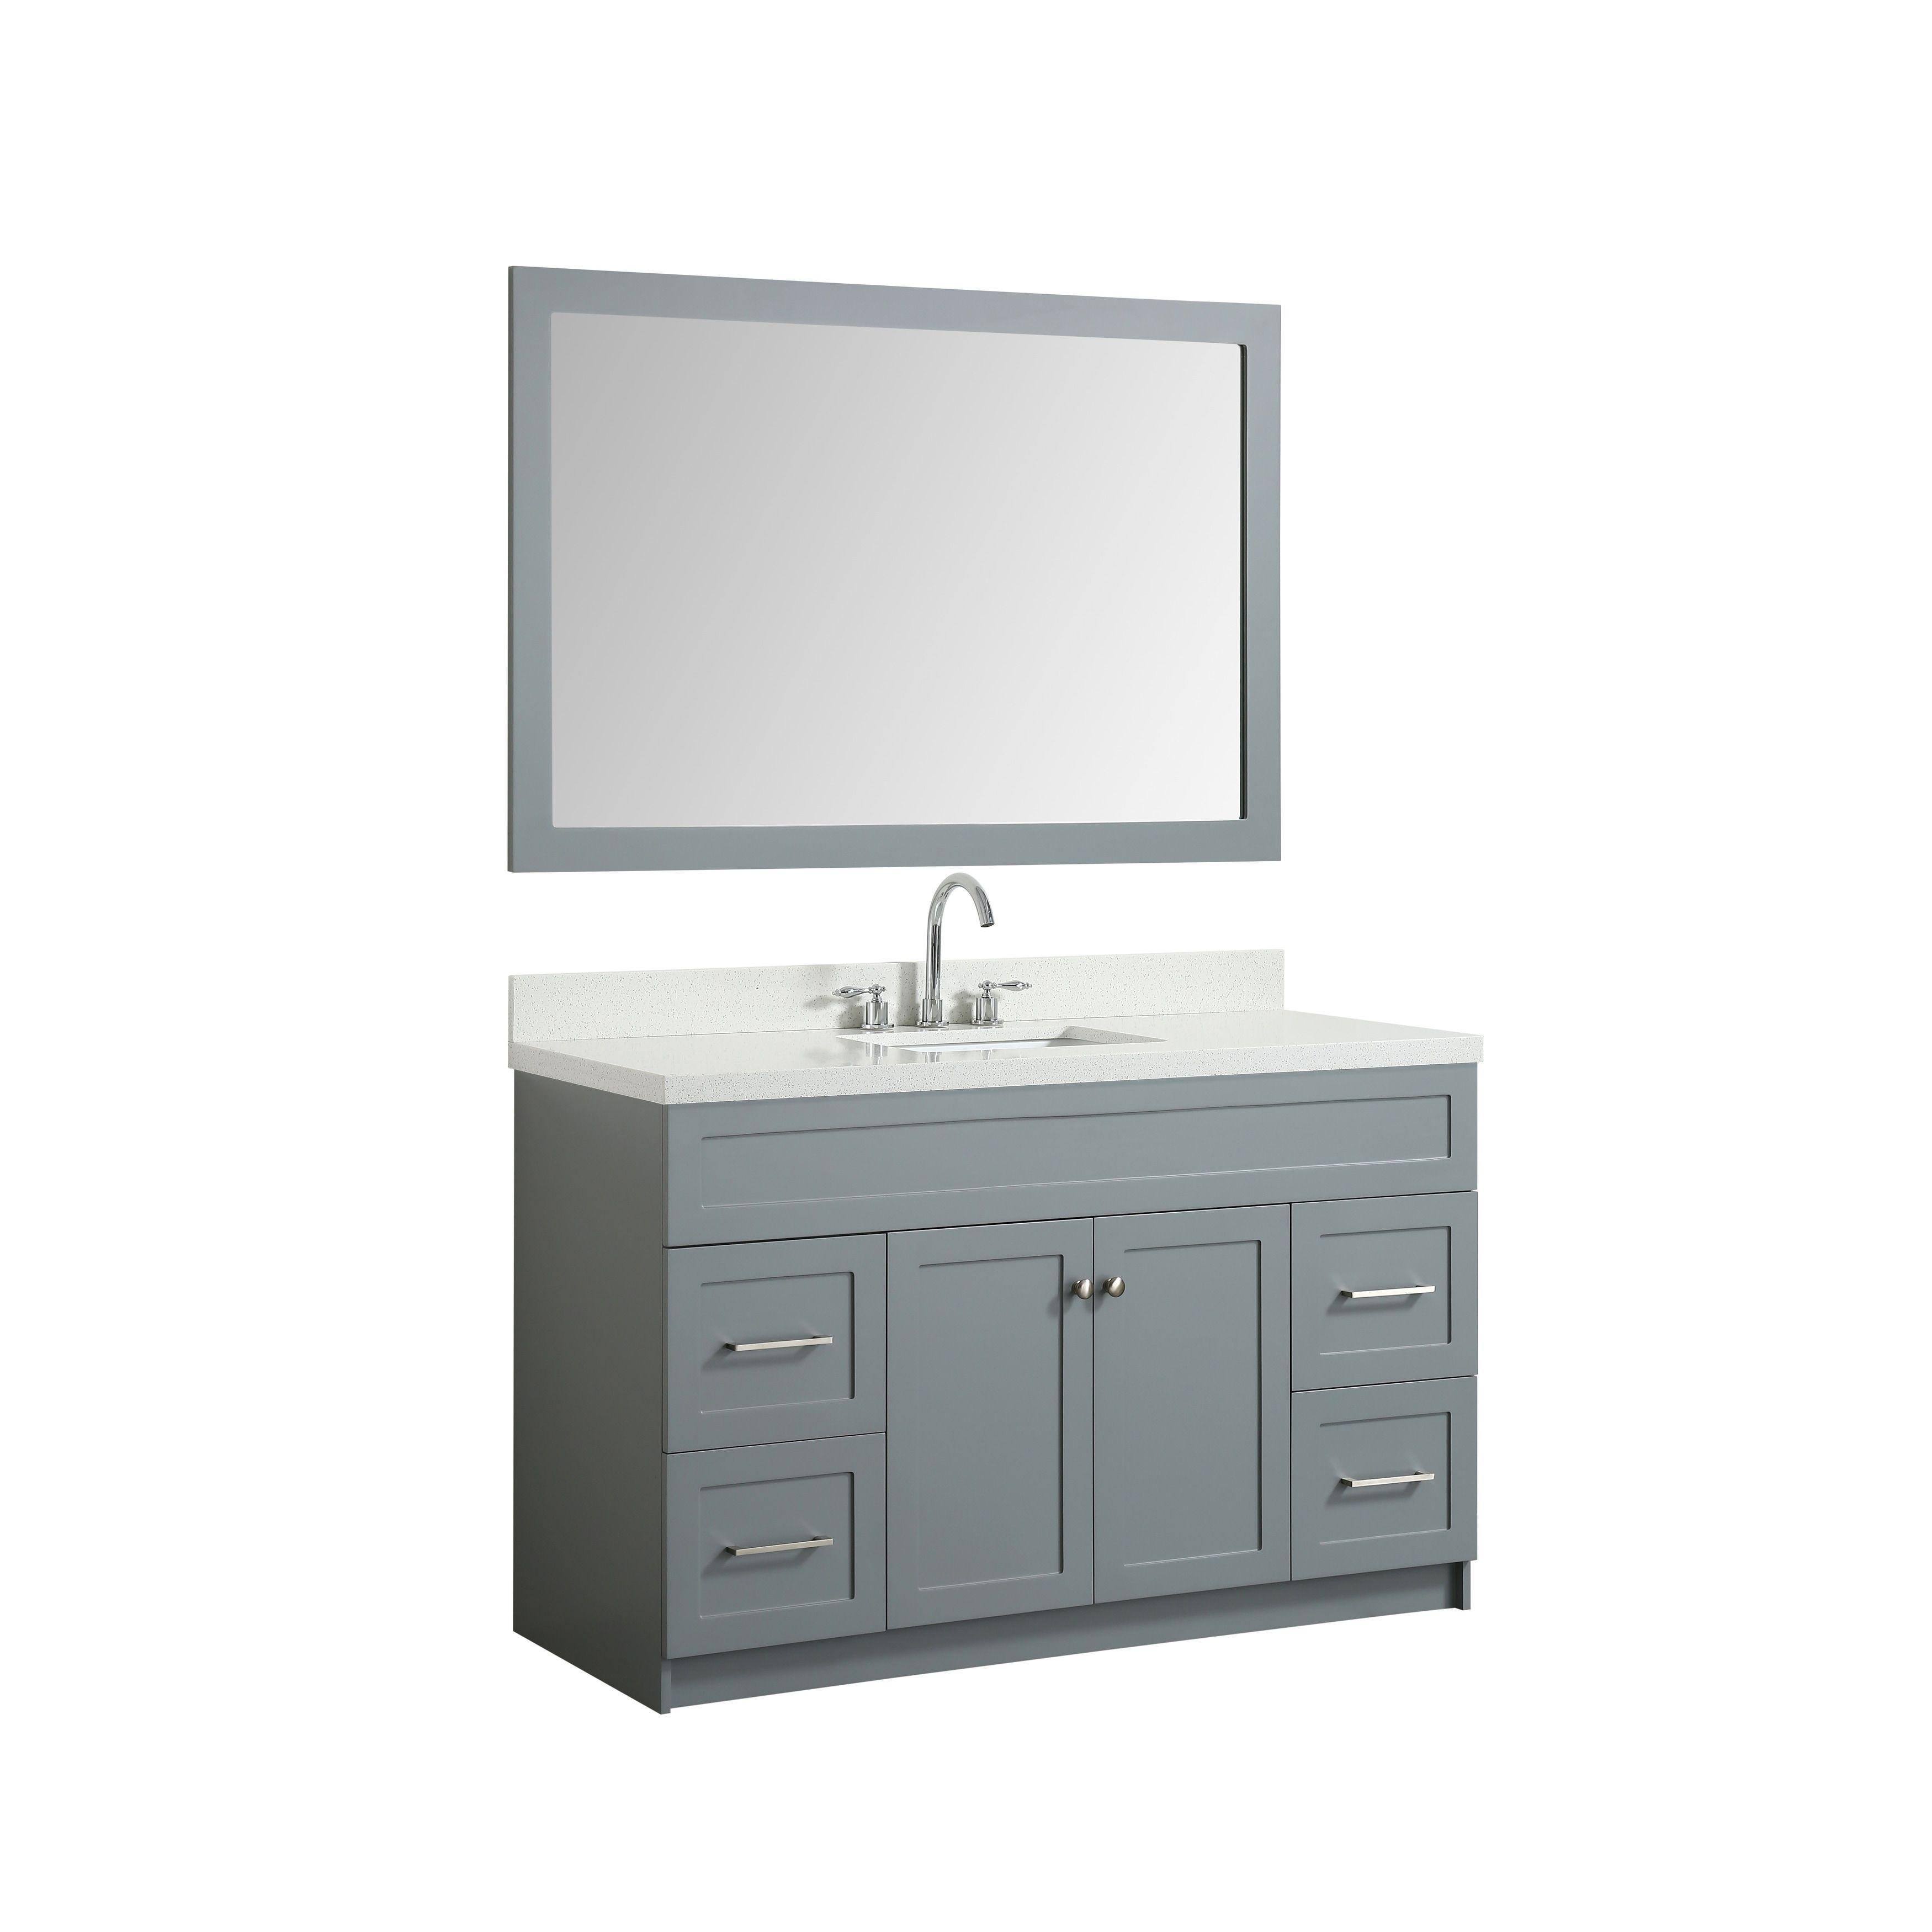 Ariel Hamlet 55 In Single Sink Vanity Set With White Quartz